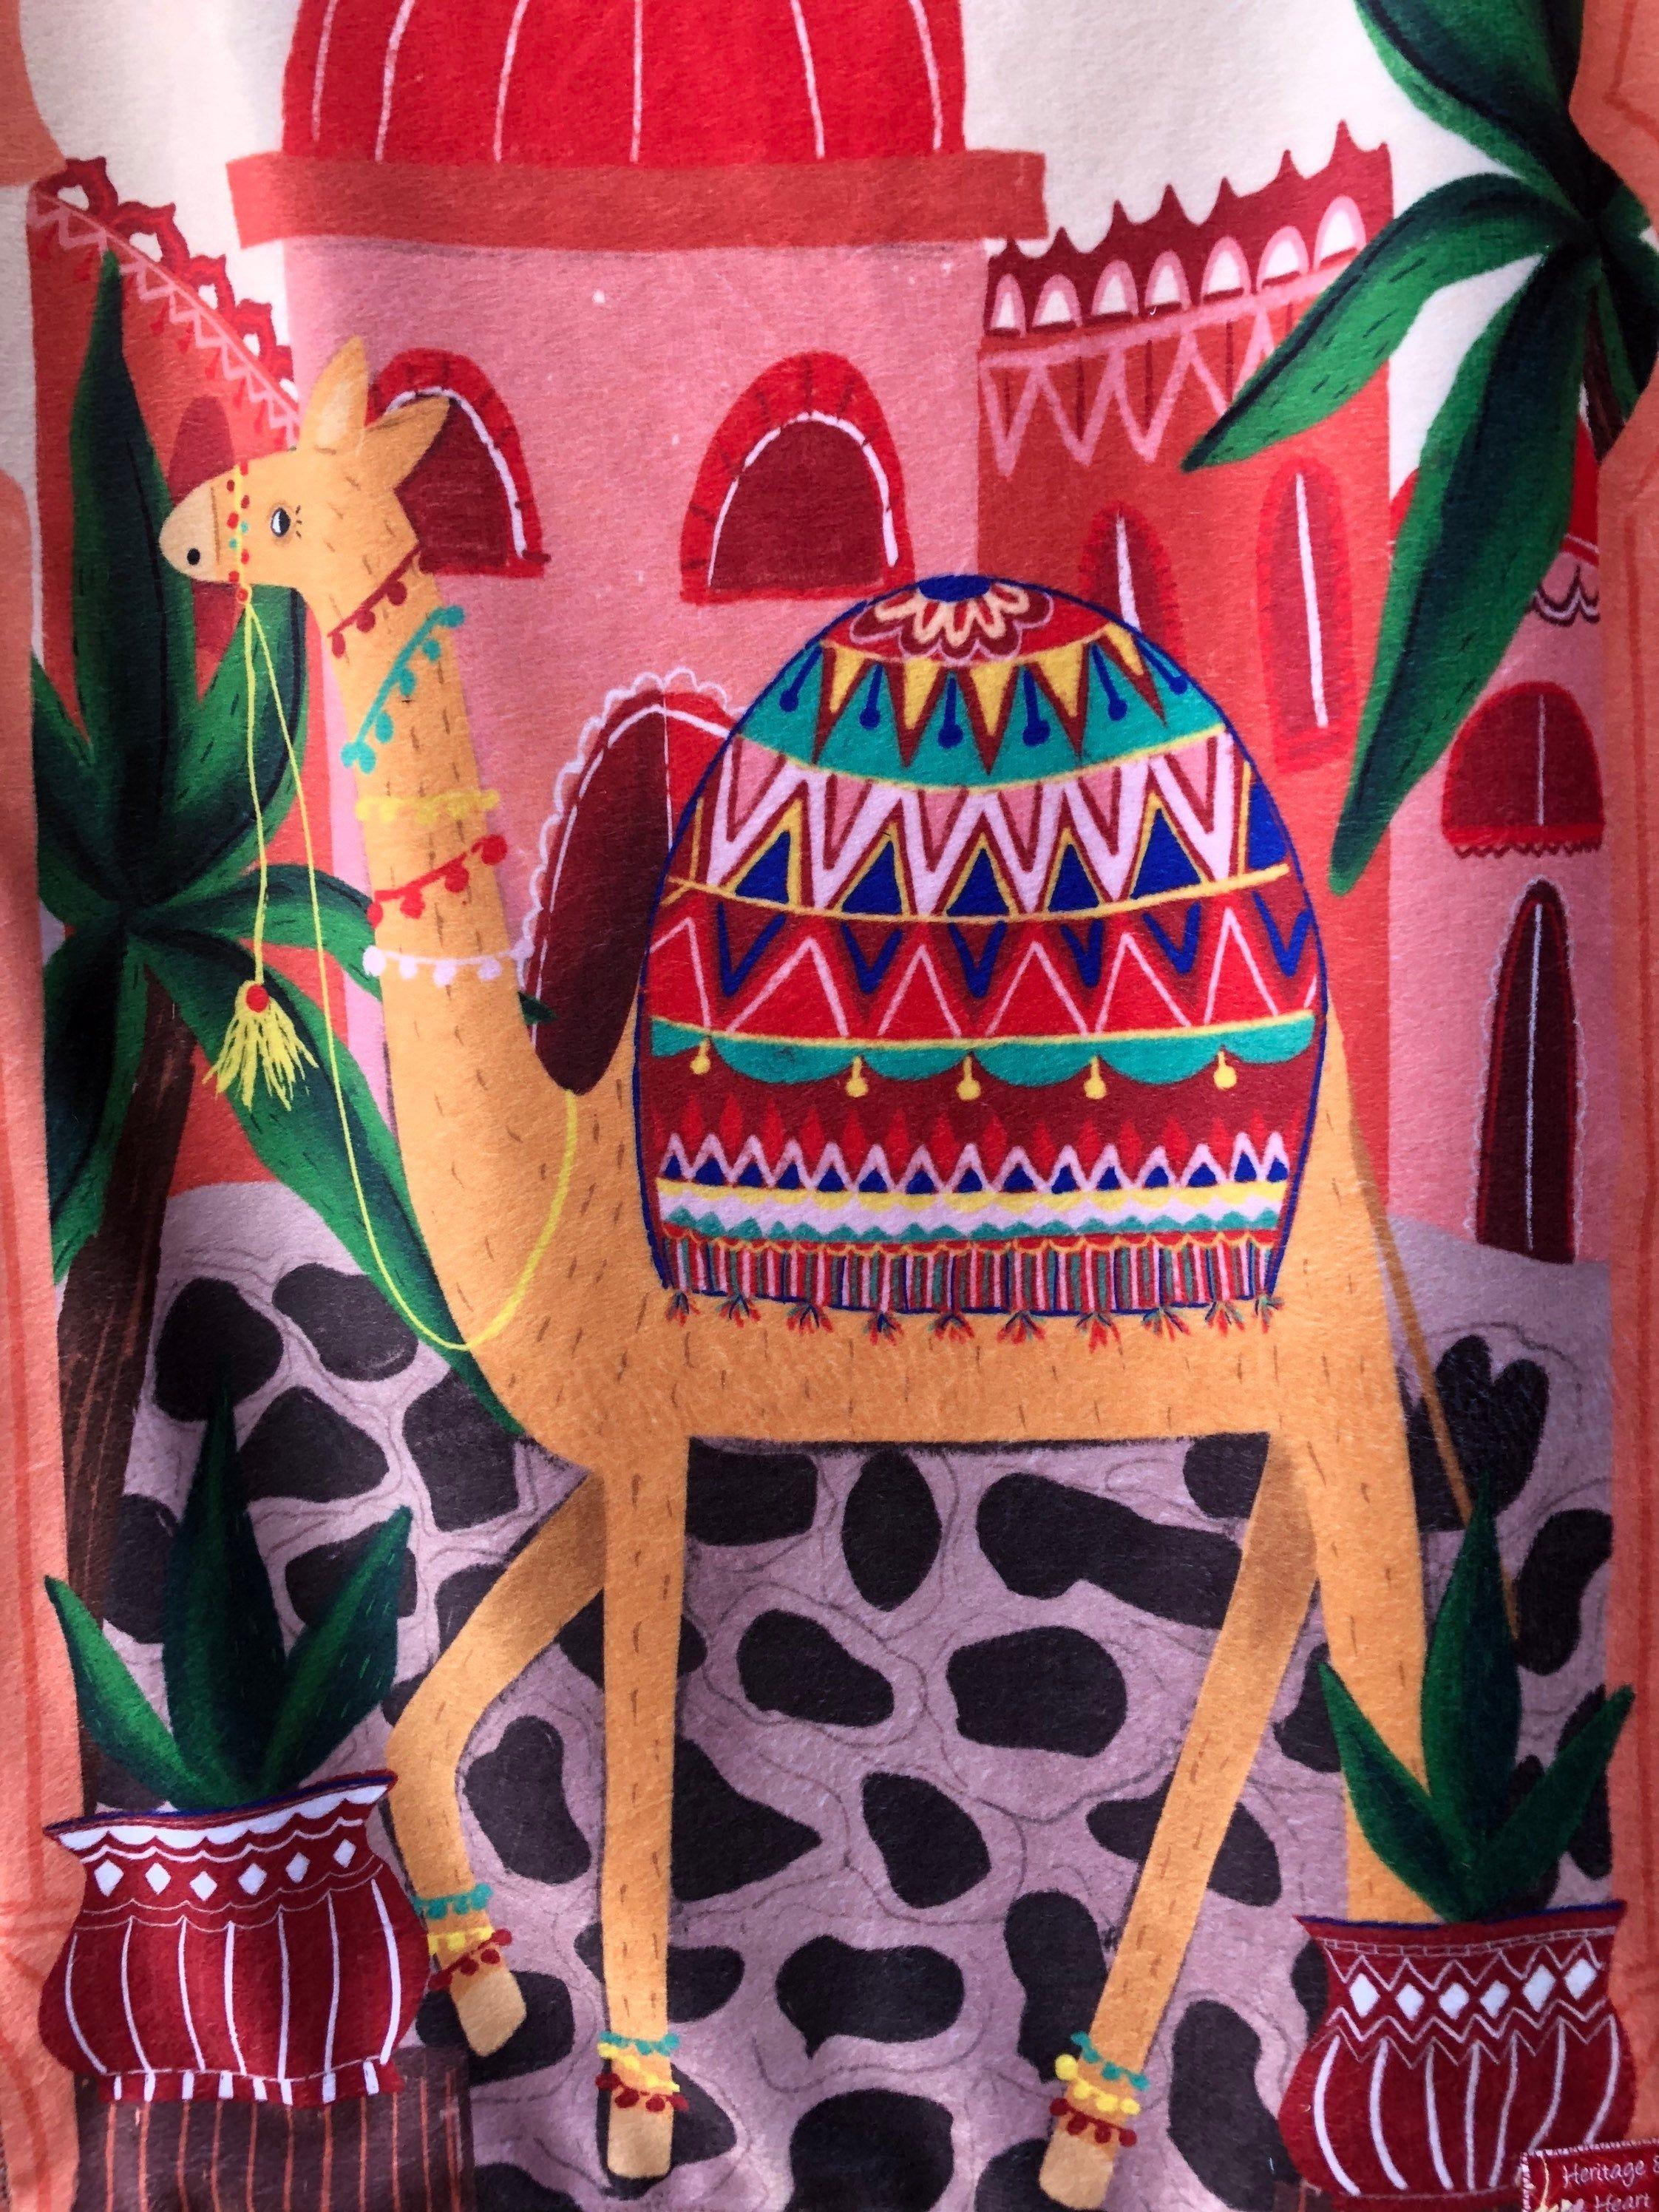 INDIA baby blanket, small - Rajasthan minky security blanket, woobie, lovey, lovie - keepsake, souvenir, decor - 17 by 26 inches